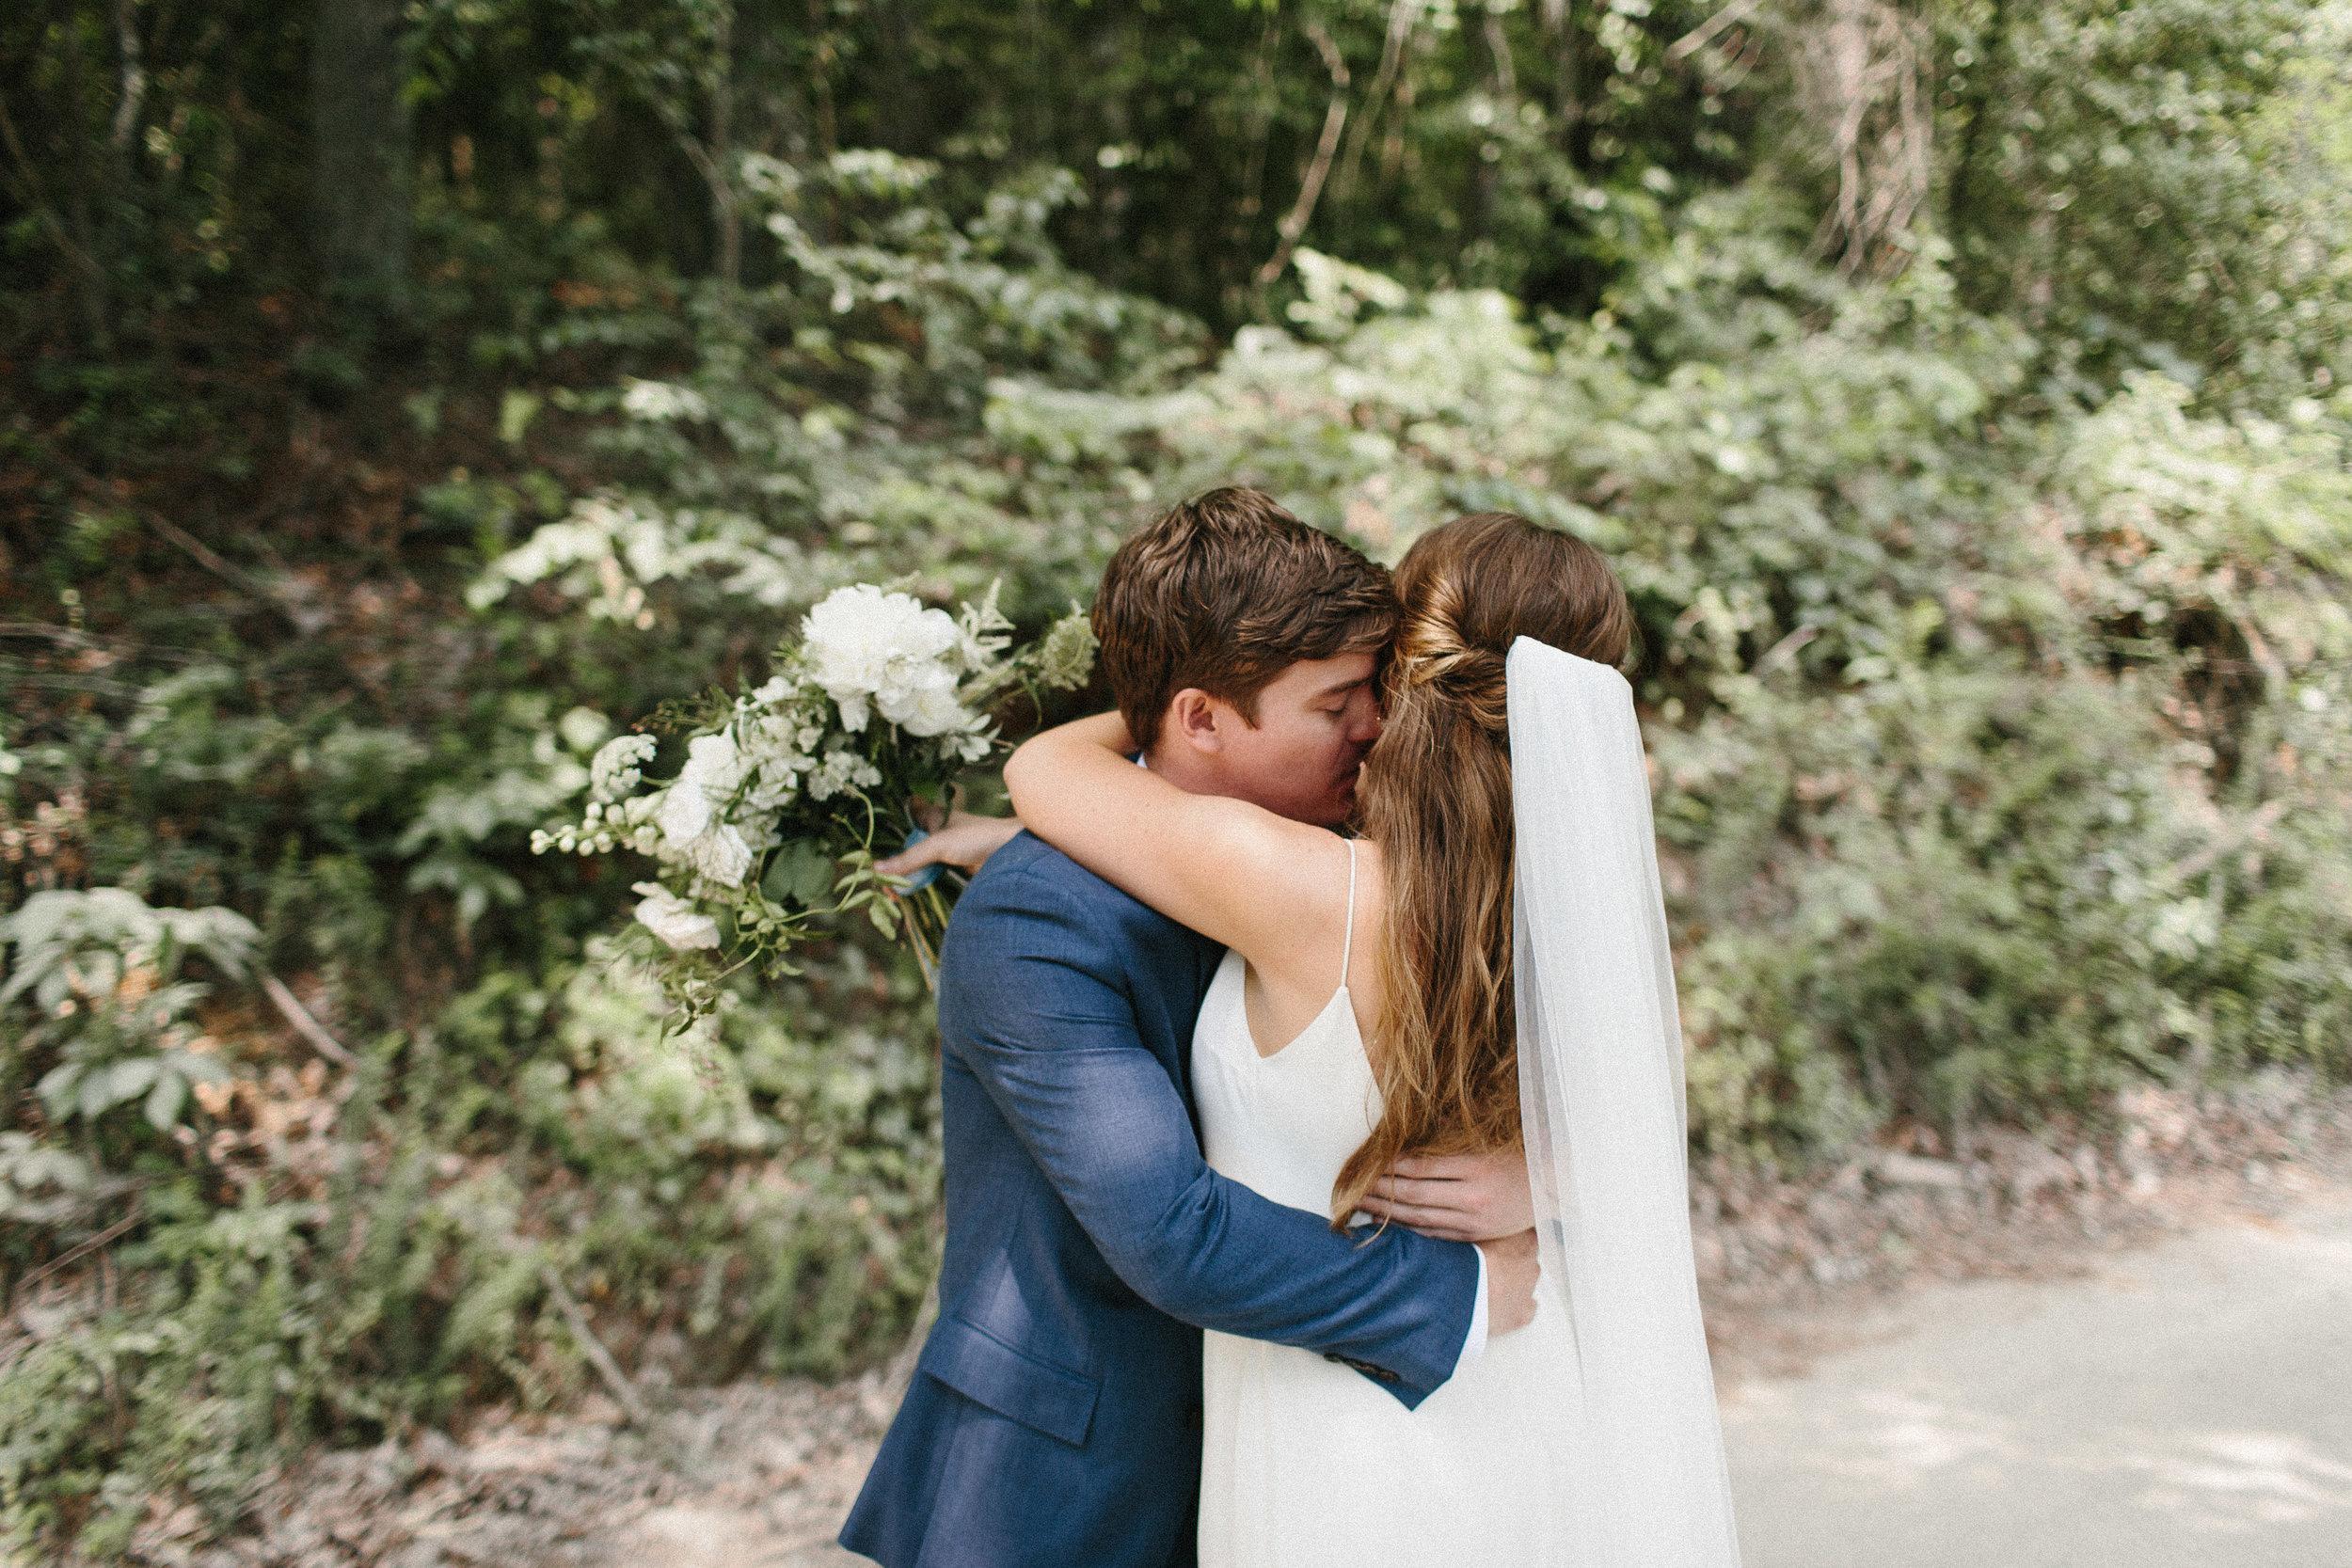 glen_ella_meadow_creekside_atlanta_wedding_photographers_1381.jpg